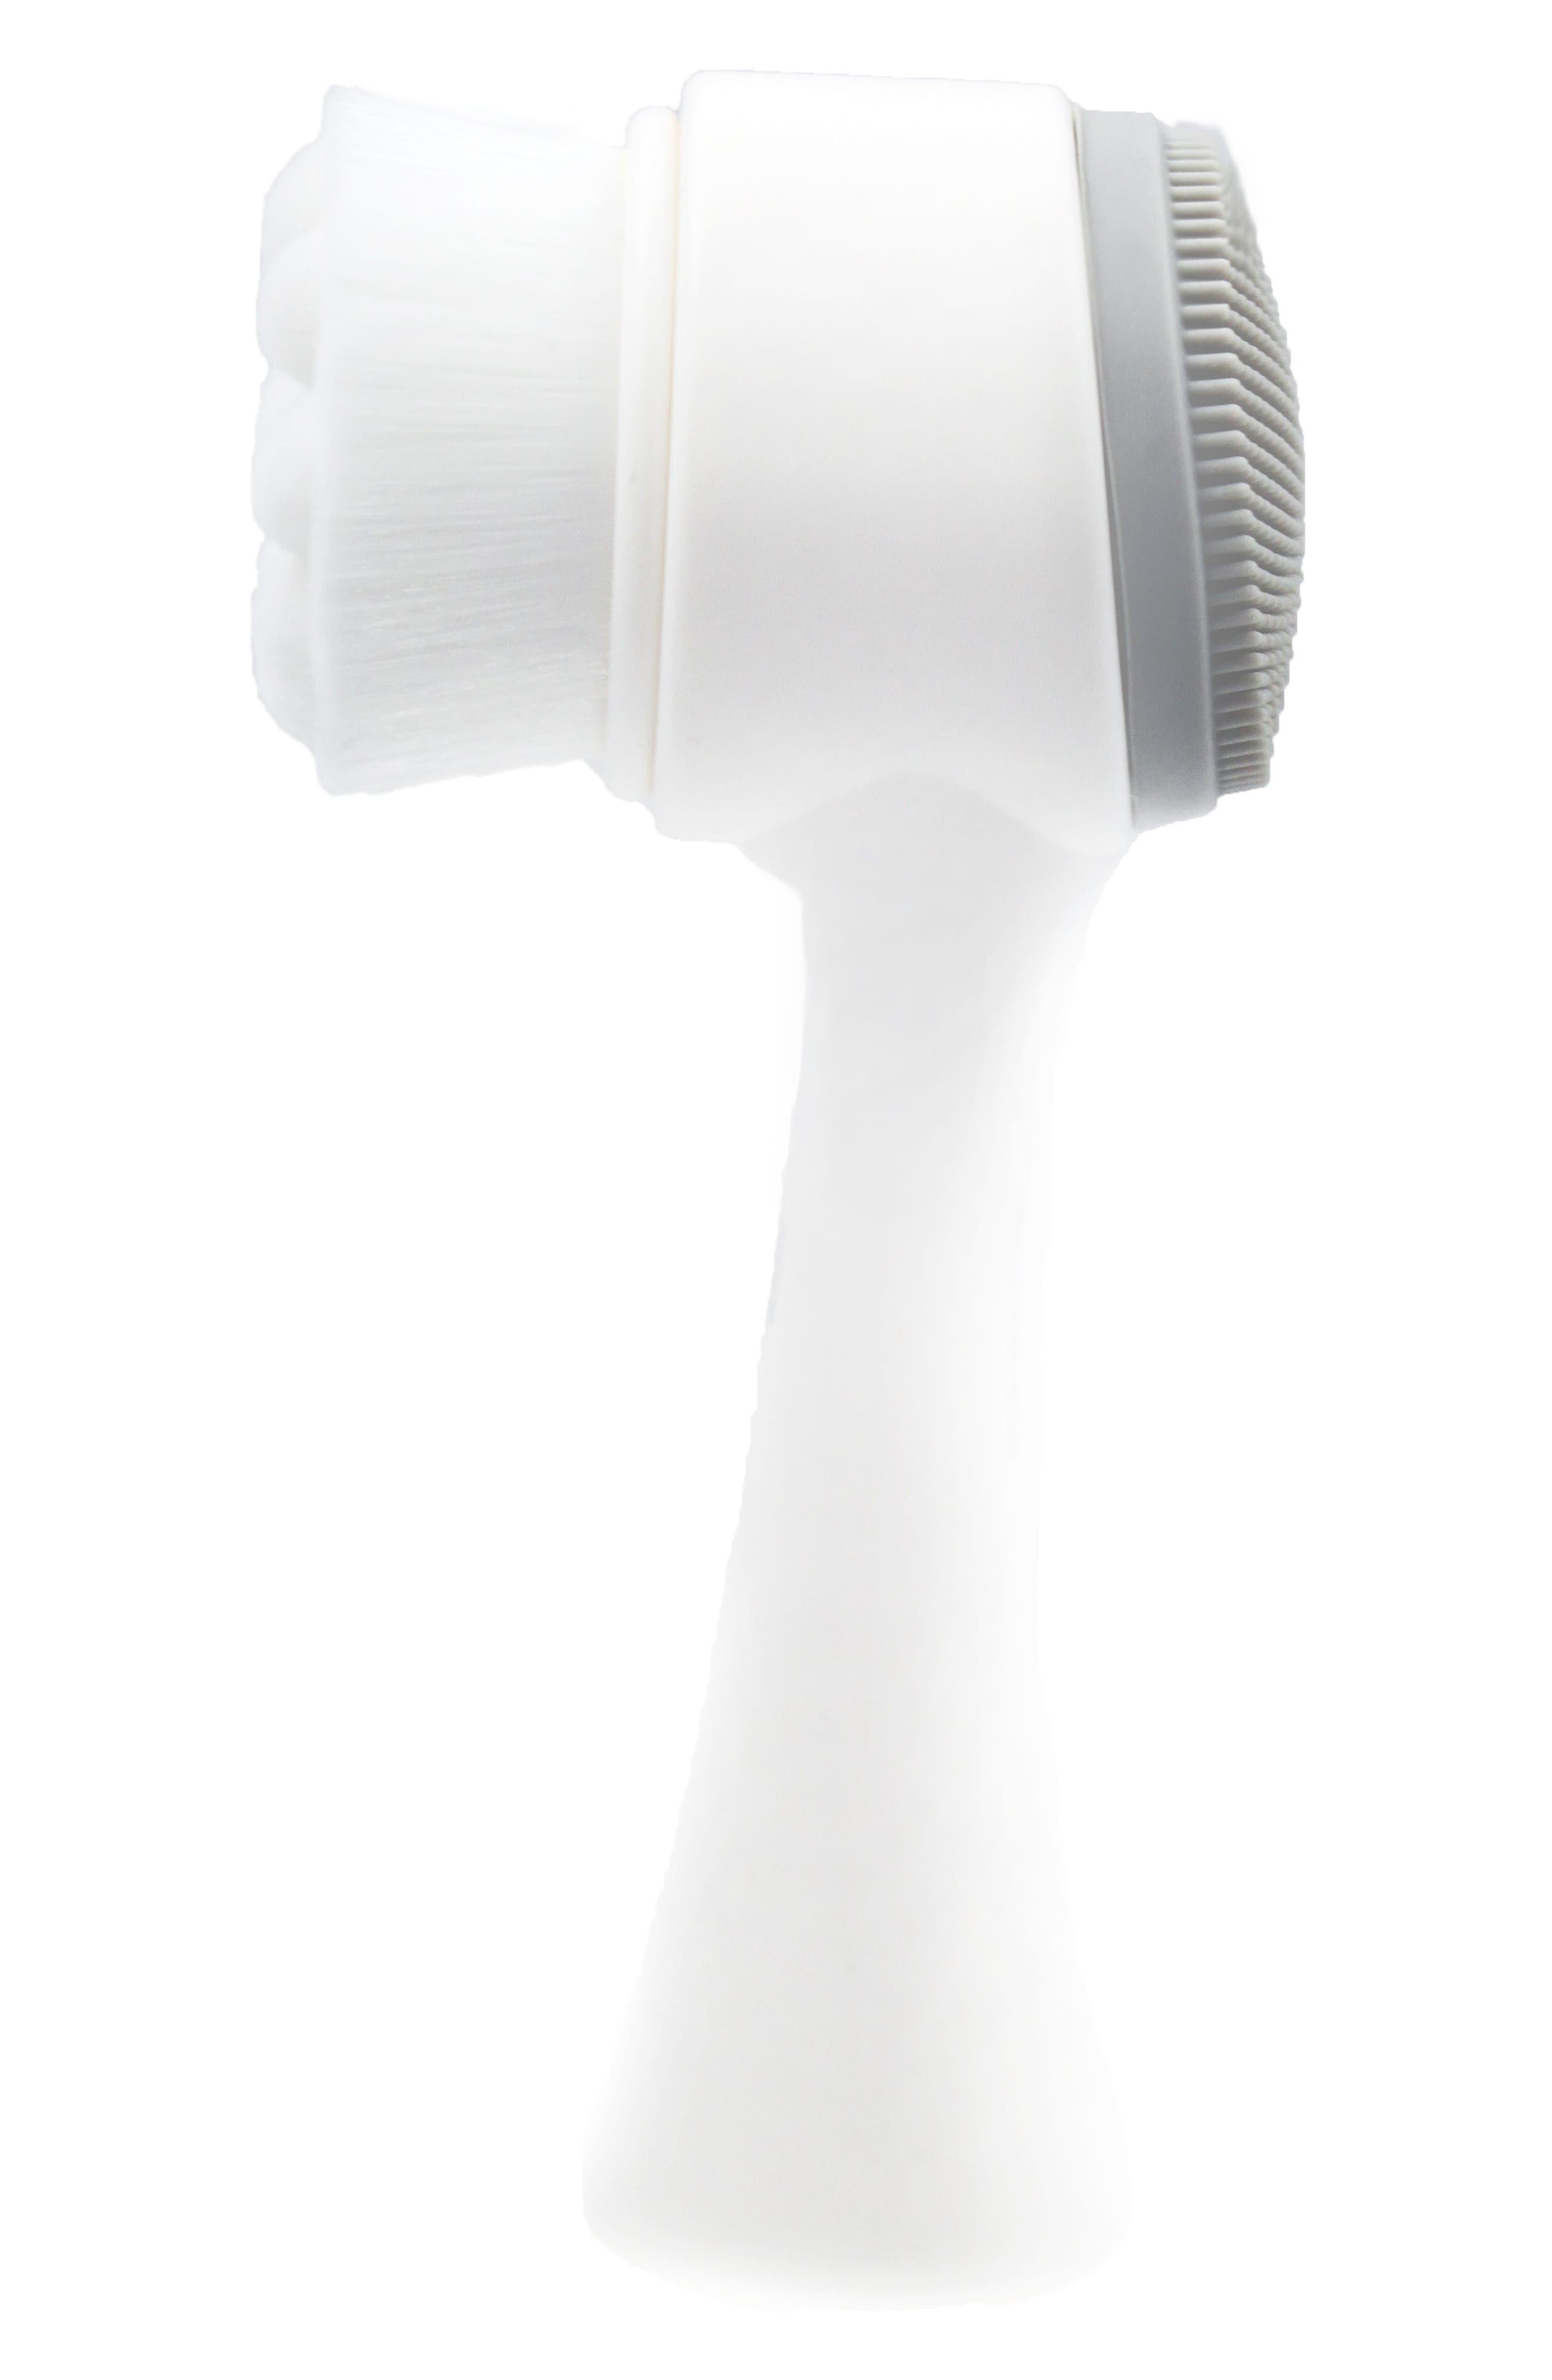 RAFFAELE RUBERTO<SUP>®</SUP> SKIN, Raffaele Ruberto<sup>®</sup> Dual-Head Pro Cleansing Brush, Main thumbnail 1, color, NO COLOR